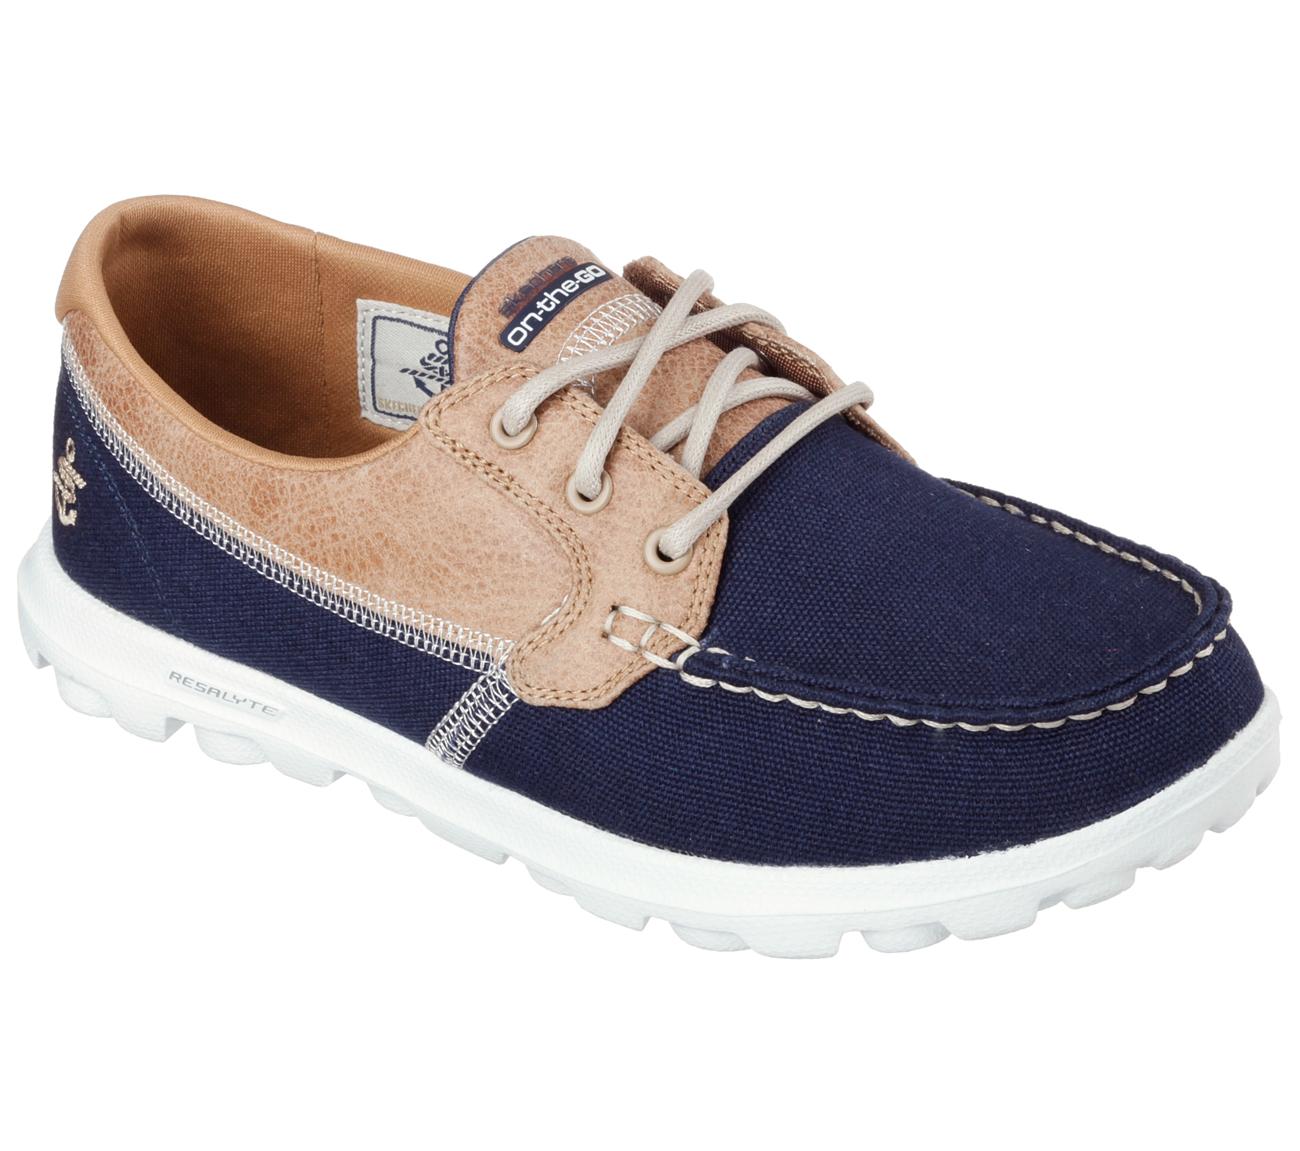 Ladies Wide Fit Boat Shoe